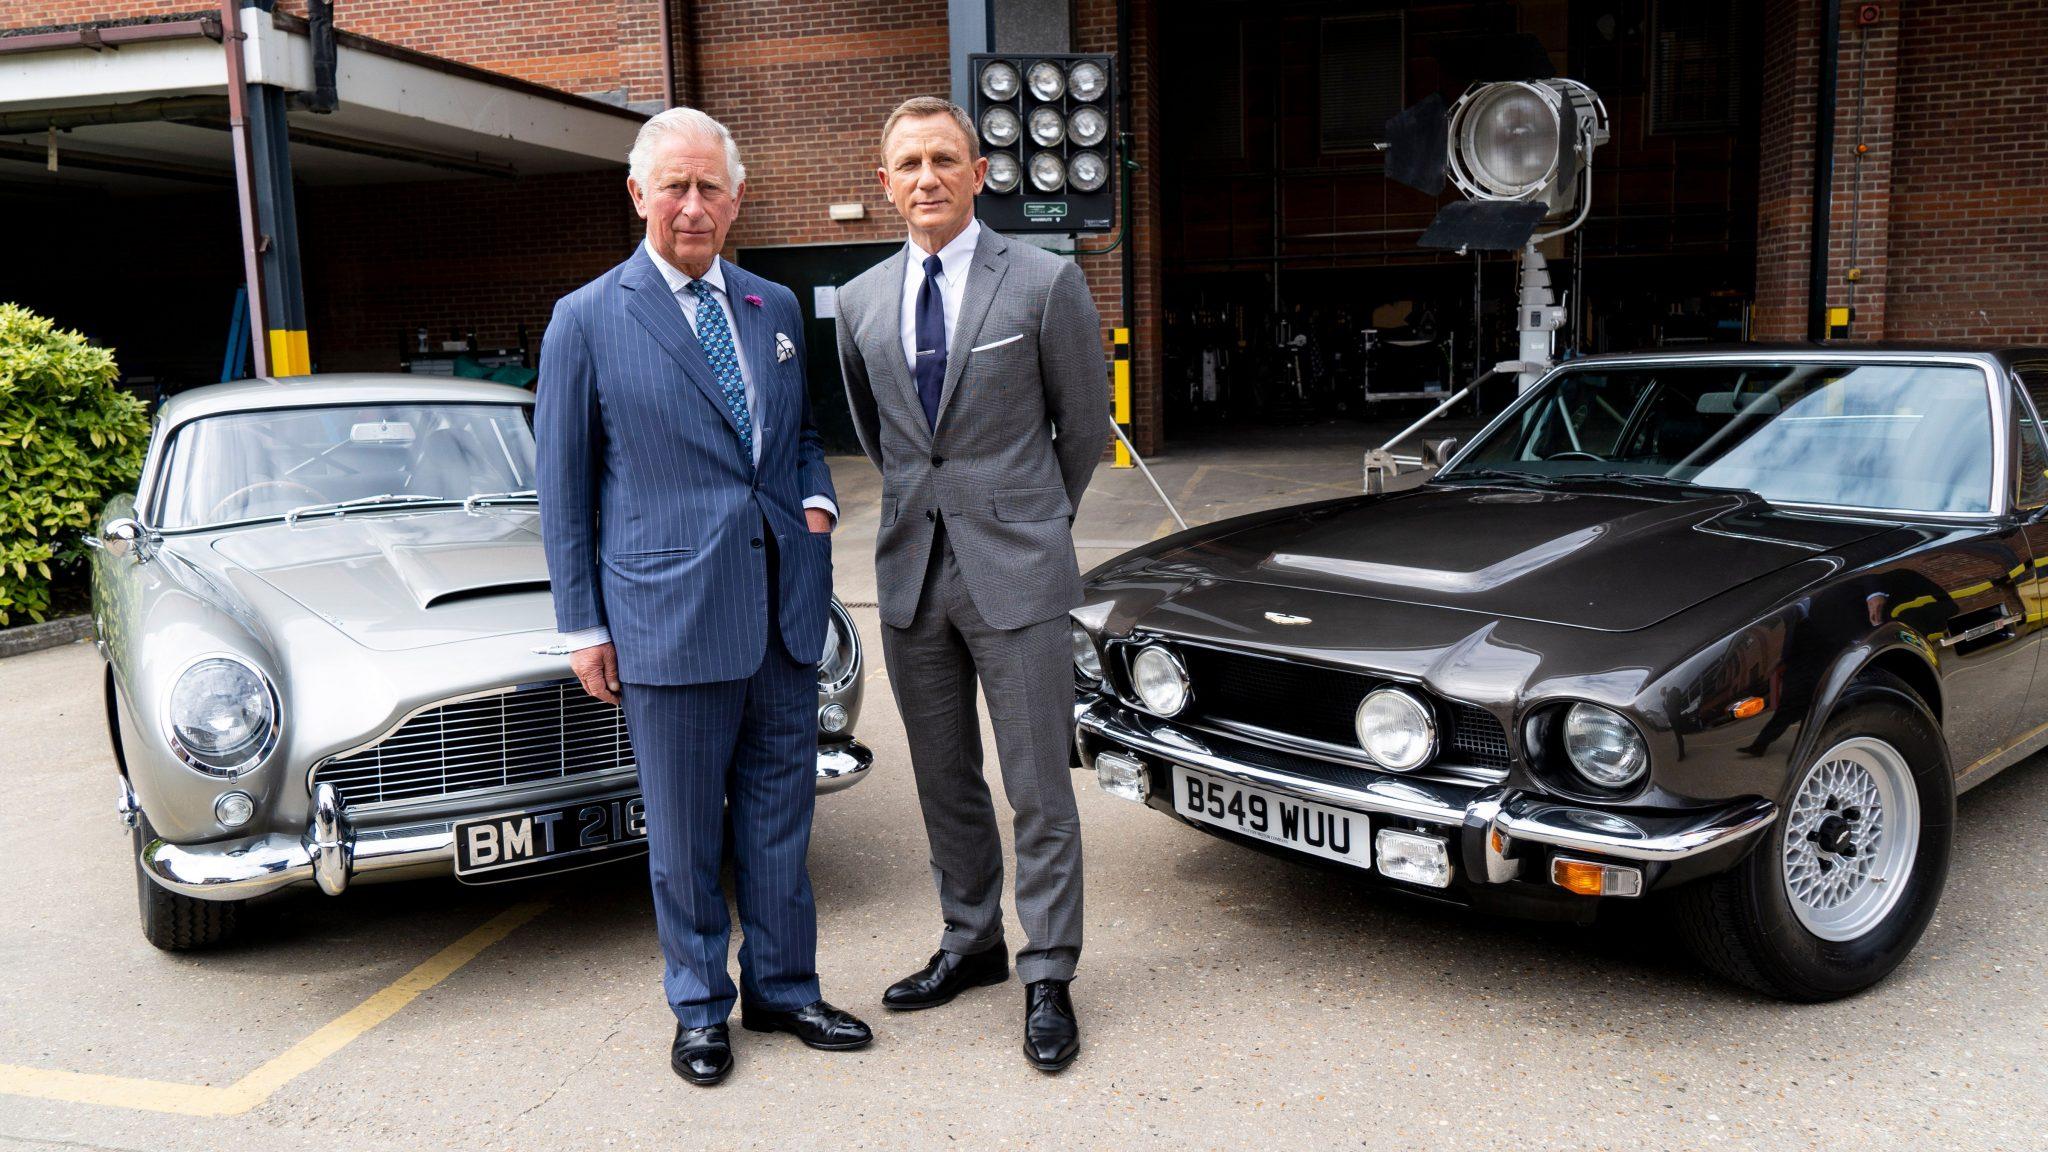 Prince Charles en Daniel Craig bij de Aston Martin V8 en DB5